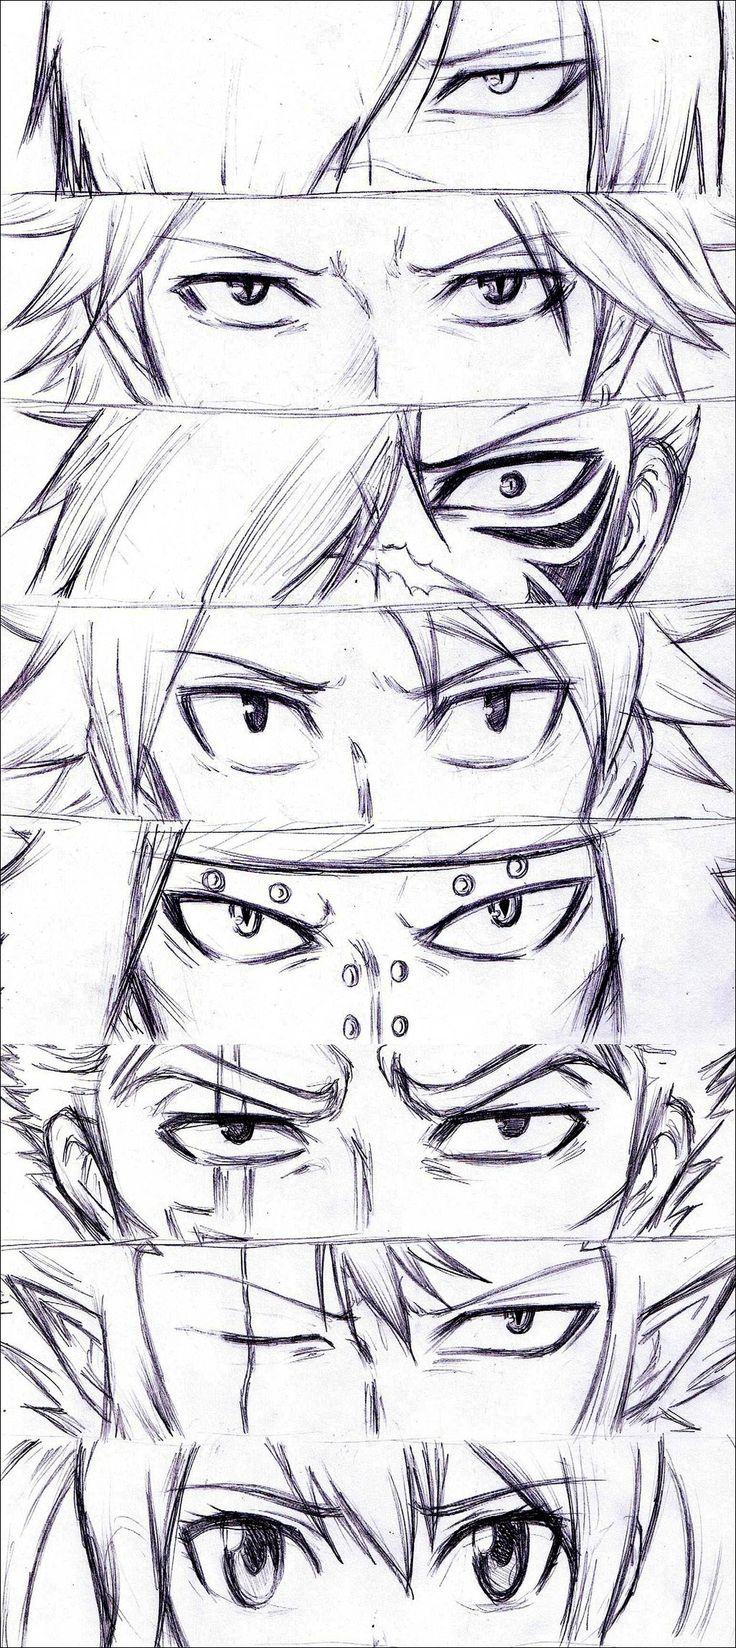 Fairy Tail - Rogue, Sting, Natsu, Gajeel, Laxus, Cobra and Wendy - Eyes dragon slayers